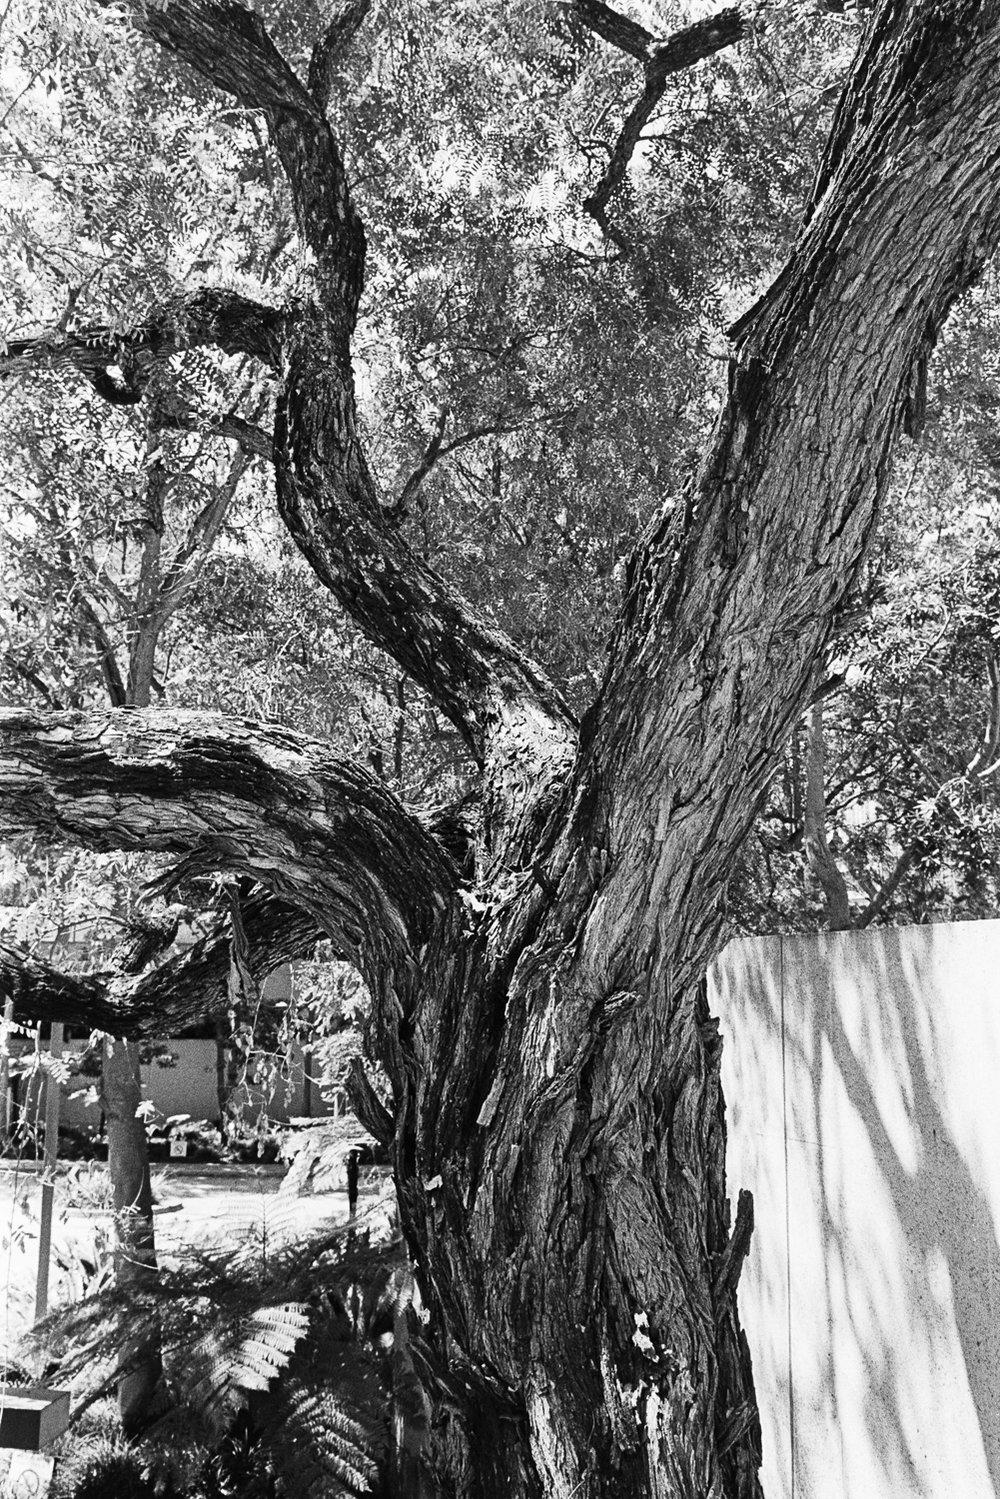 A beautiful tree.